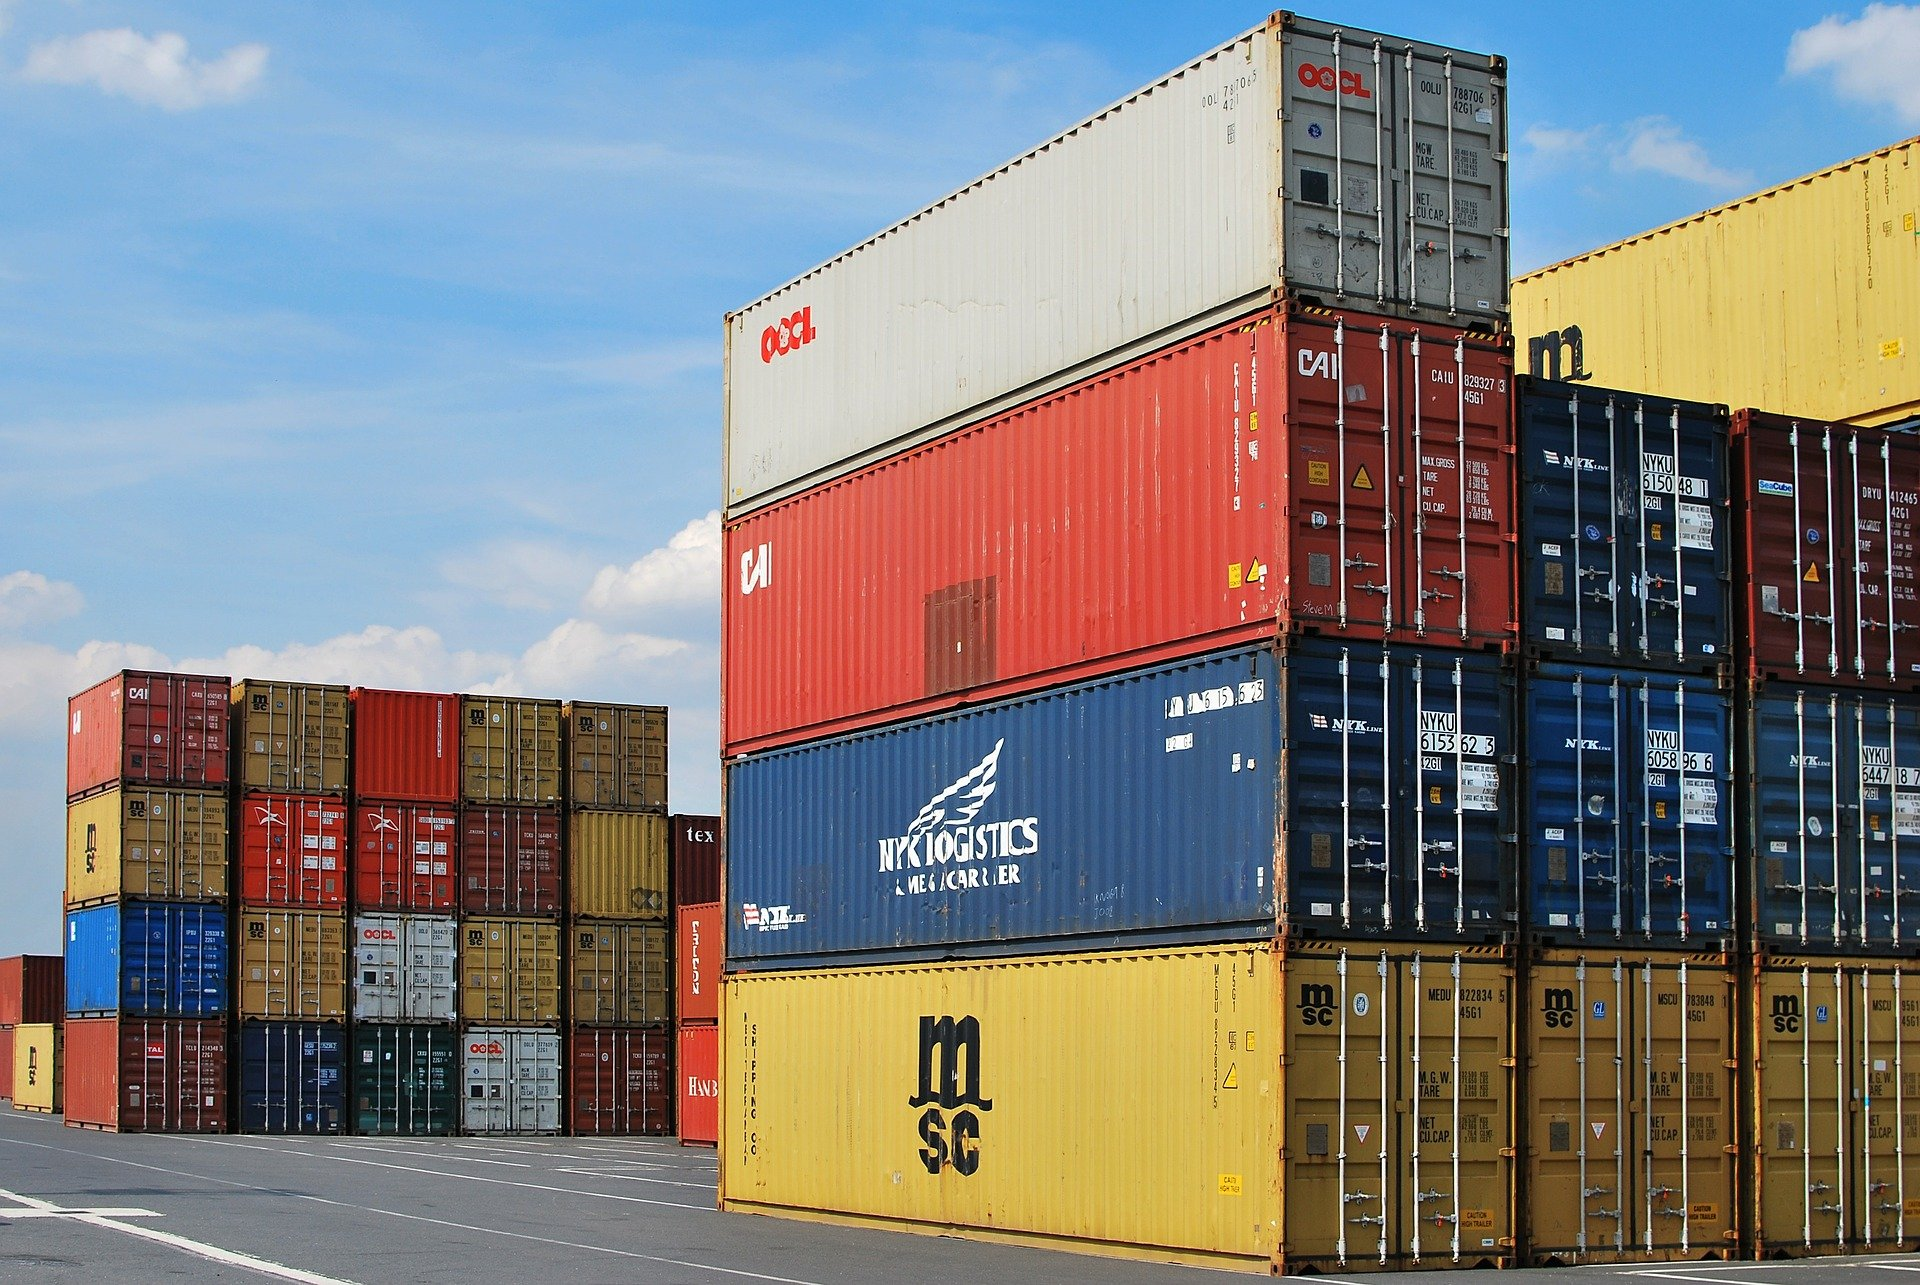 E-commerce MercadoLibre столкнется с конкуренцией на родном рынке